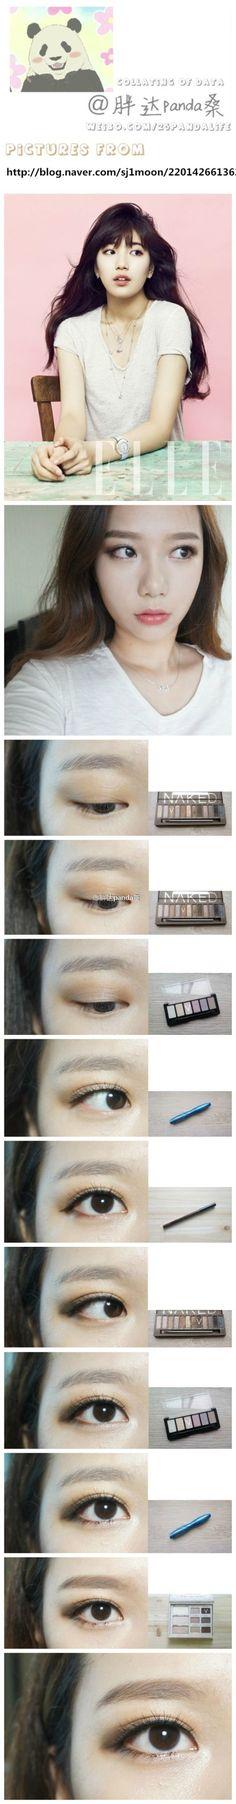 Korean make up #Nerium #optimera #wrinklecream www.SkincareinKorea.info